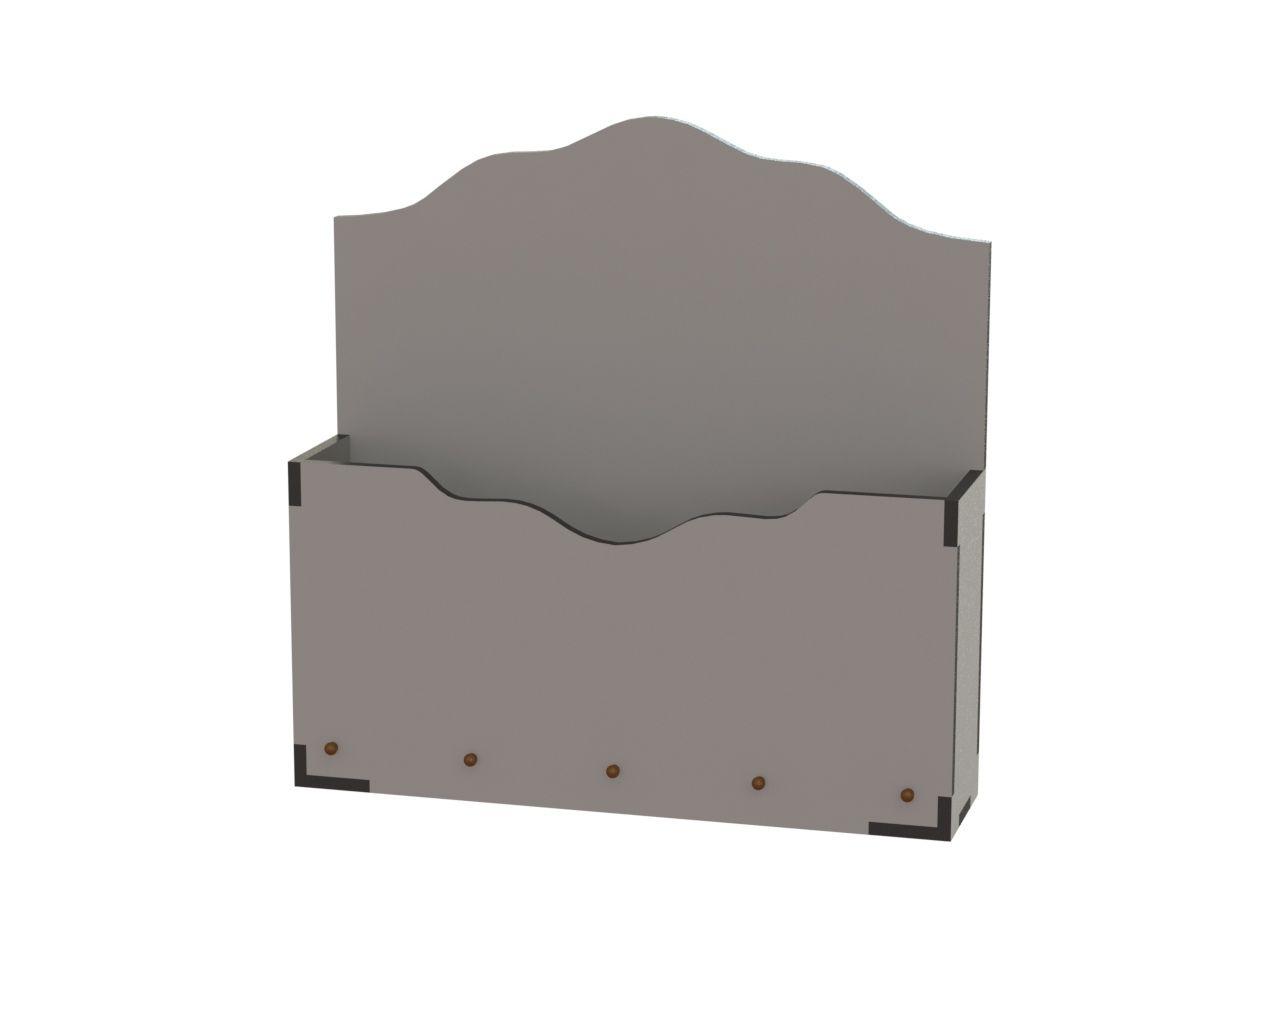 Cnc Laser Cut Simple Storage Box Free DXF File